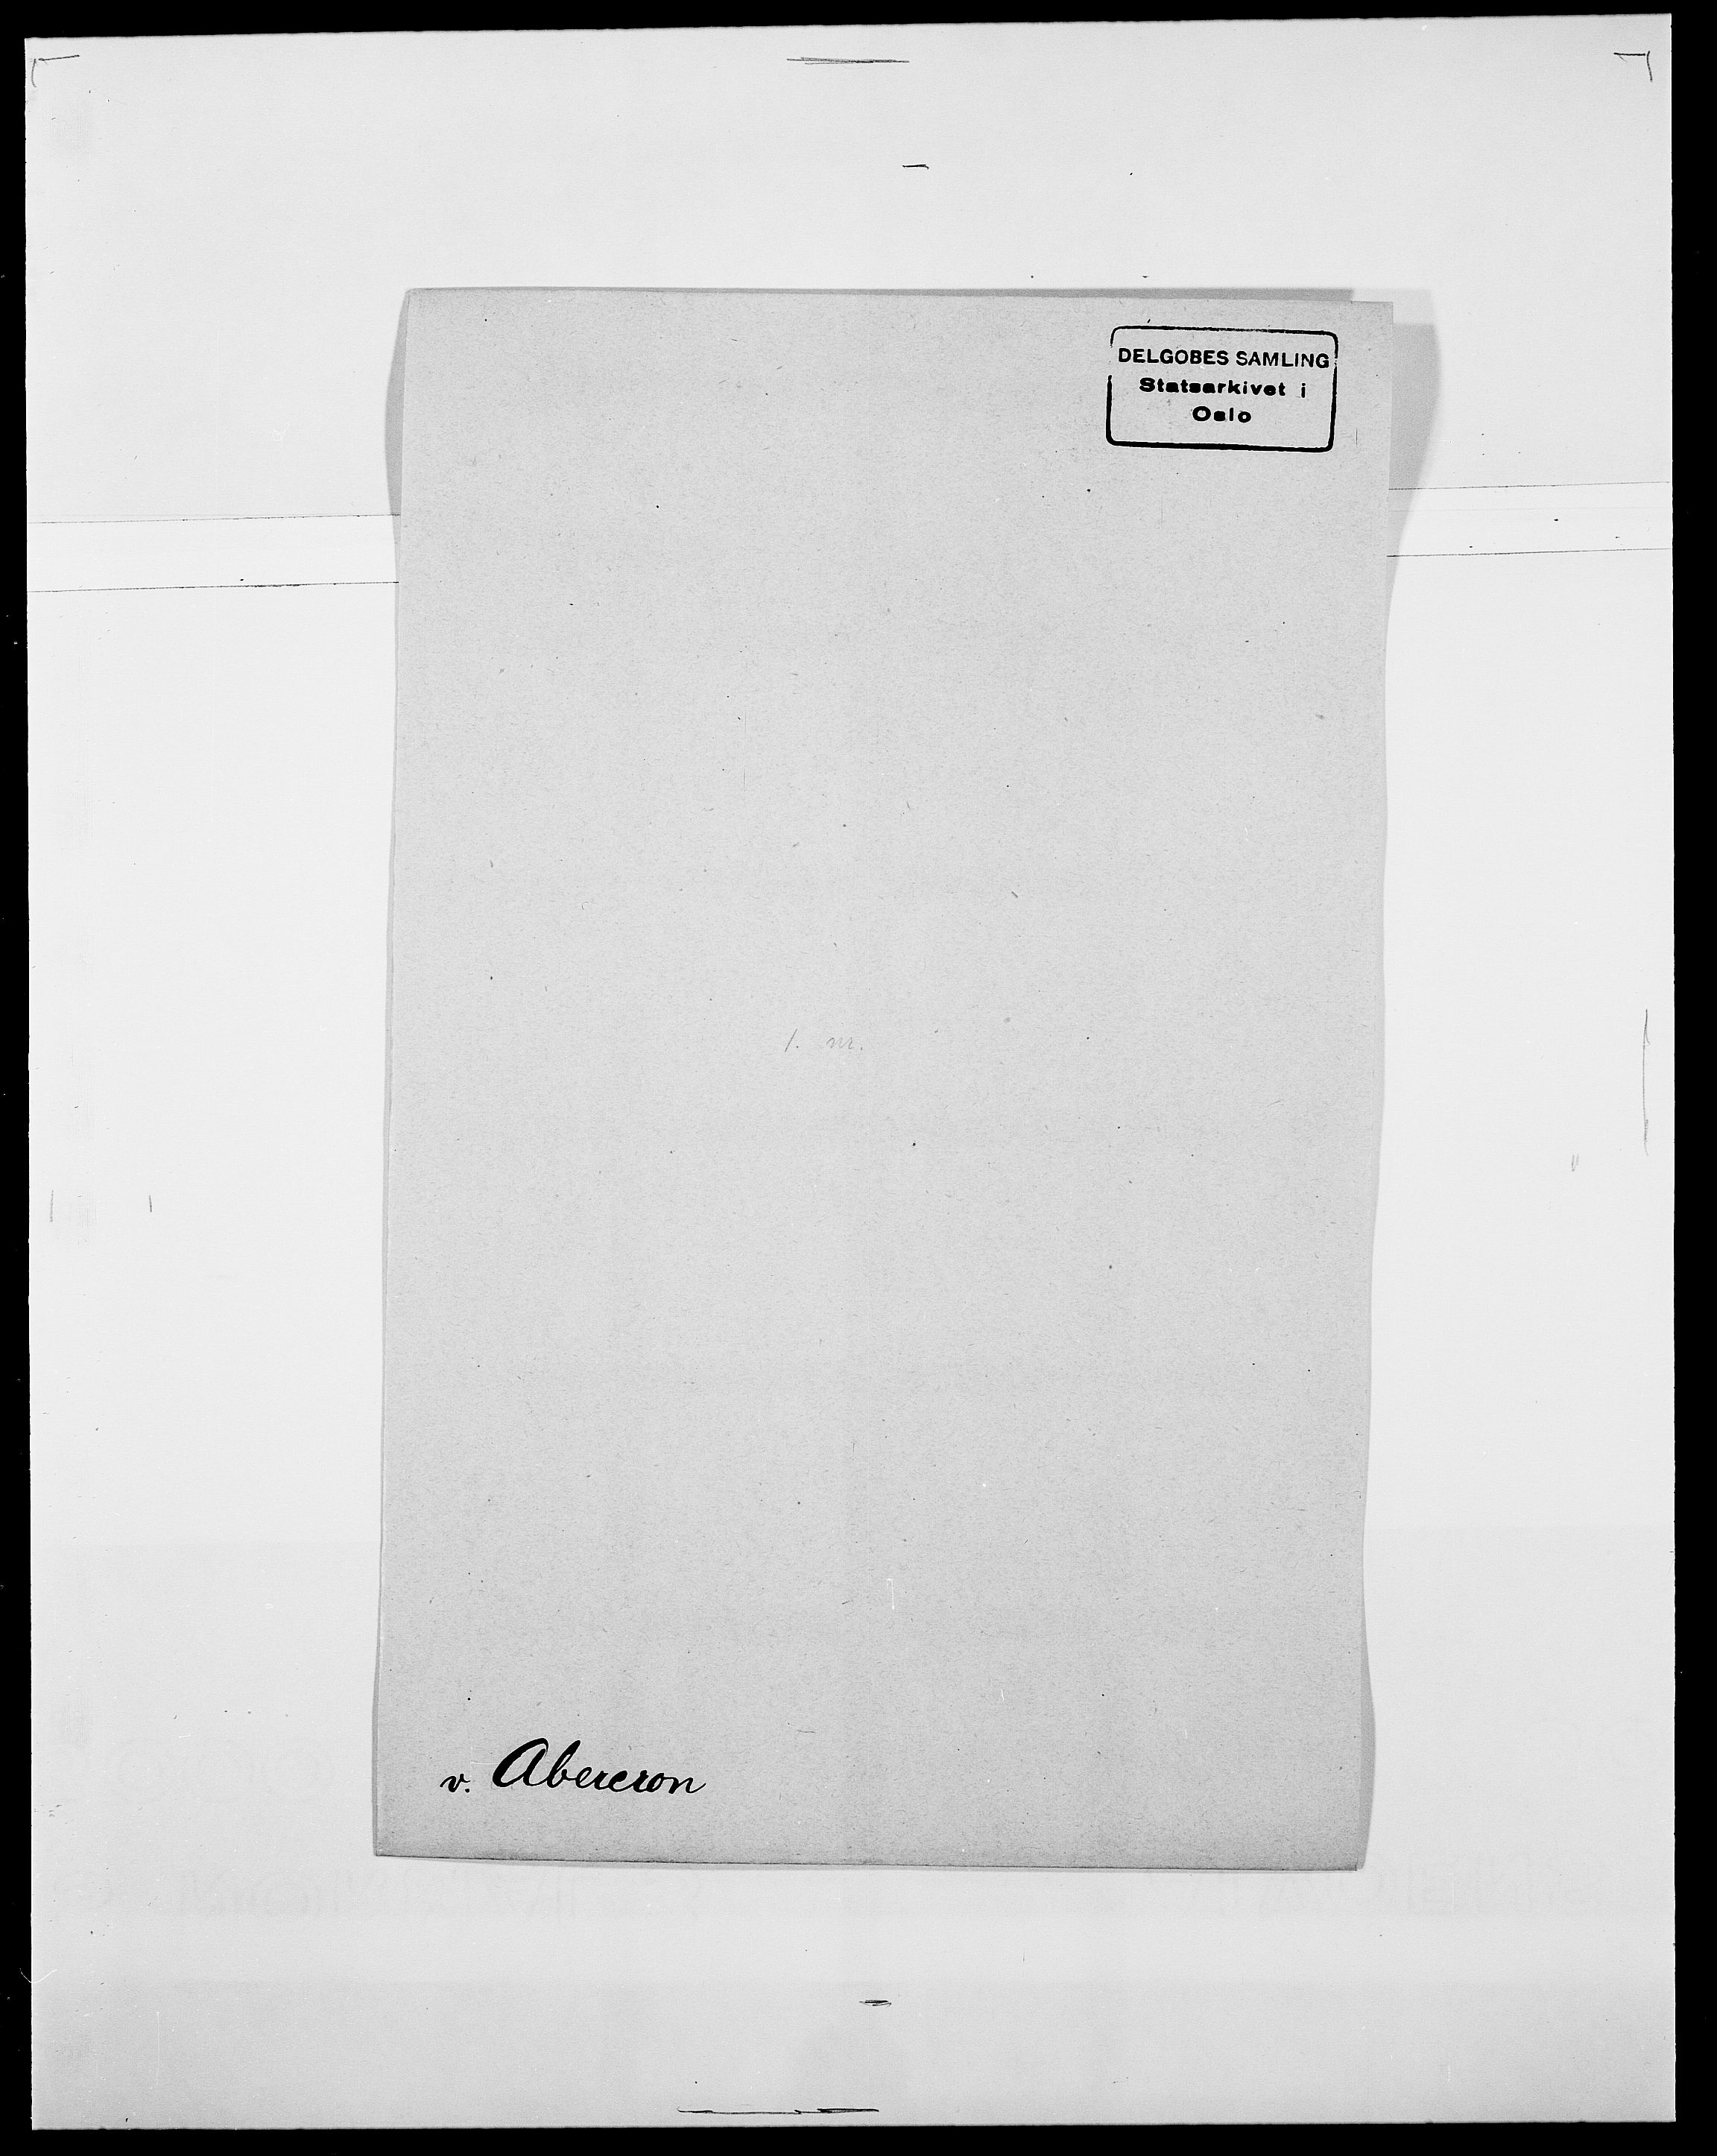 SAO, Delgobe, Charles Antoine - samling, D/Da/L0001: Aabye - Angerman, s. 208